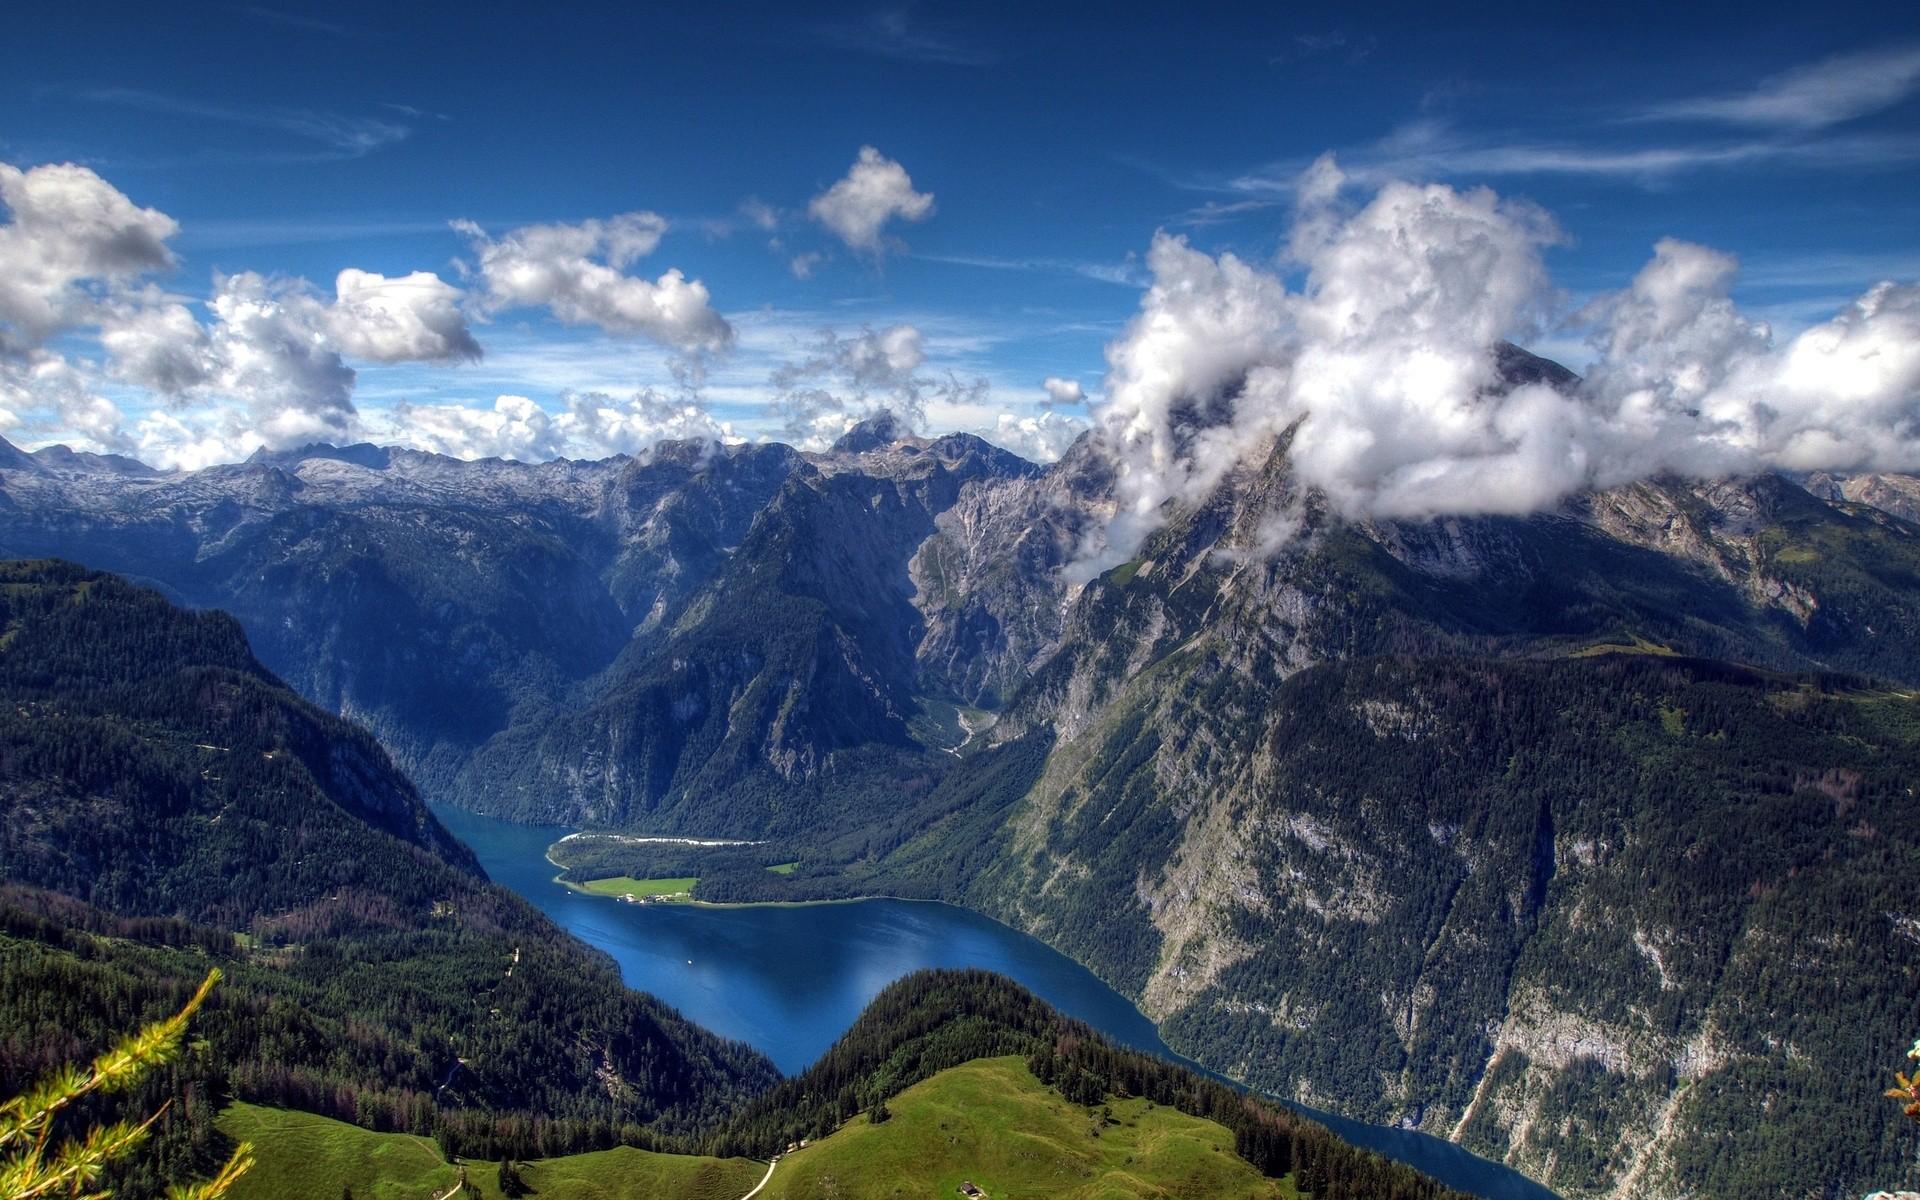 General 1920x1200 nature landscape mountains aerial view Alps Berchtesgaden National Park